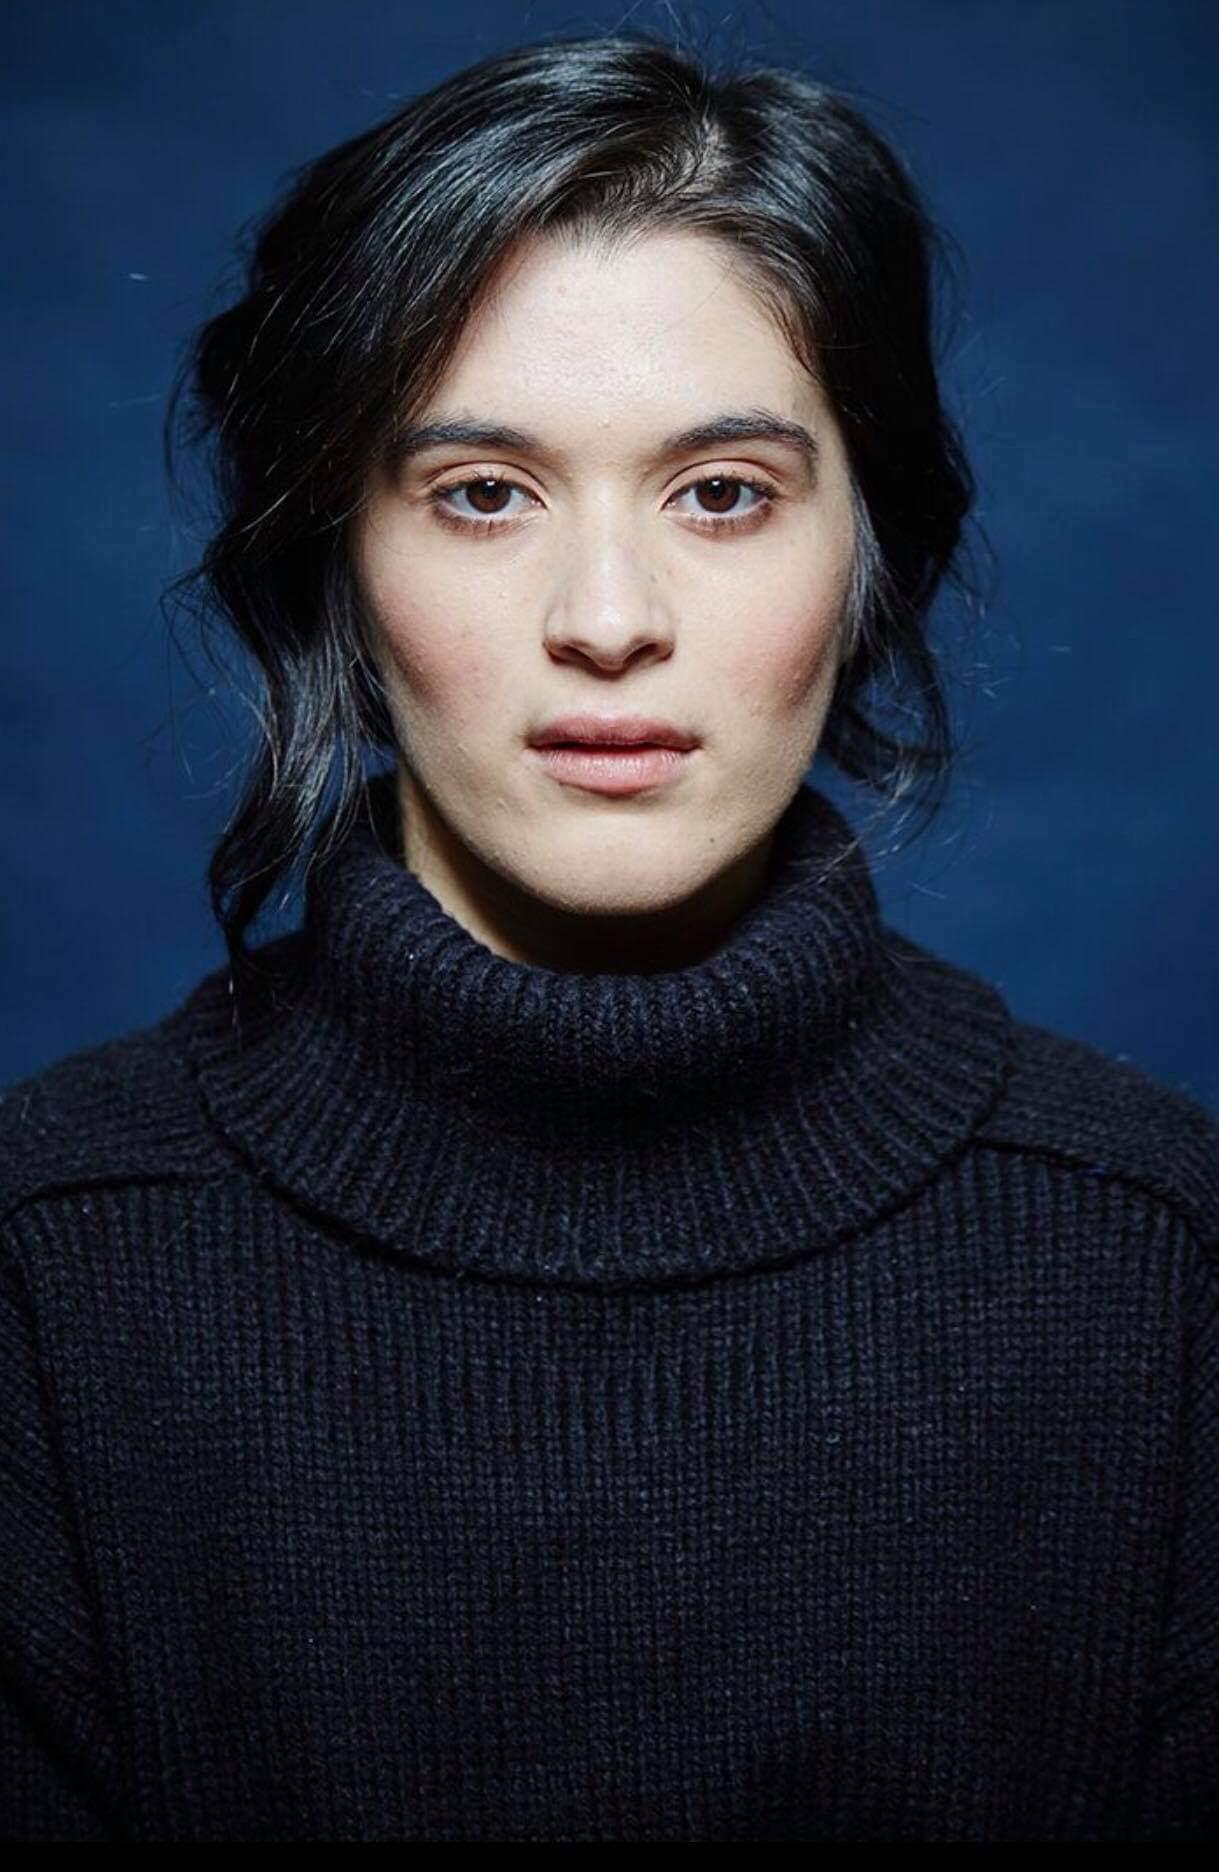 Andrea Mudbidri